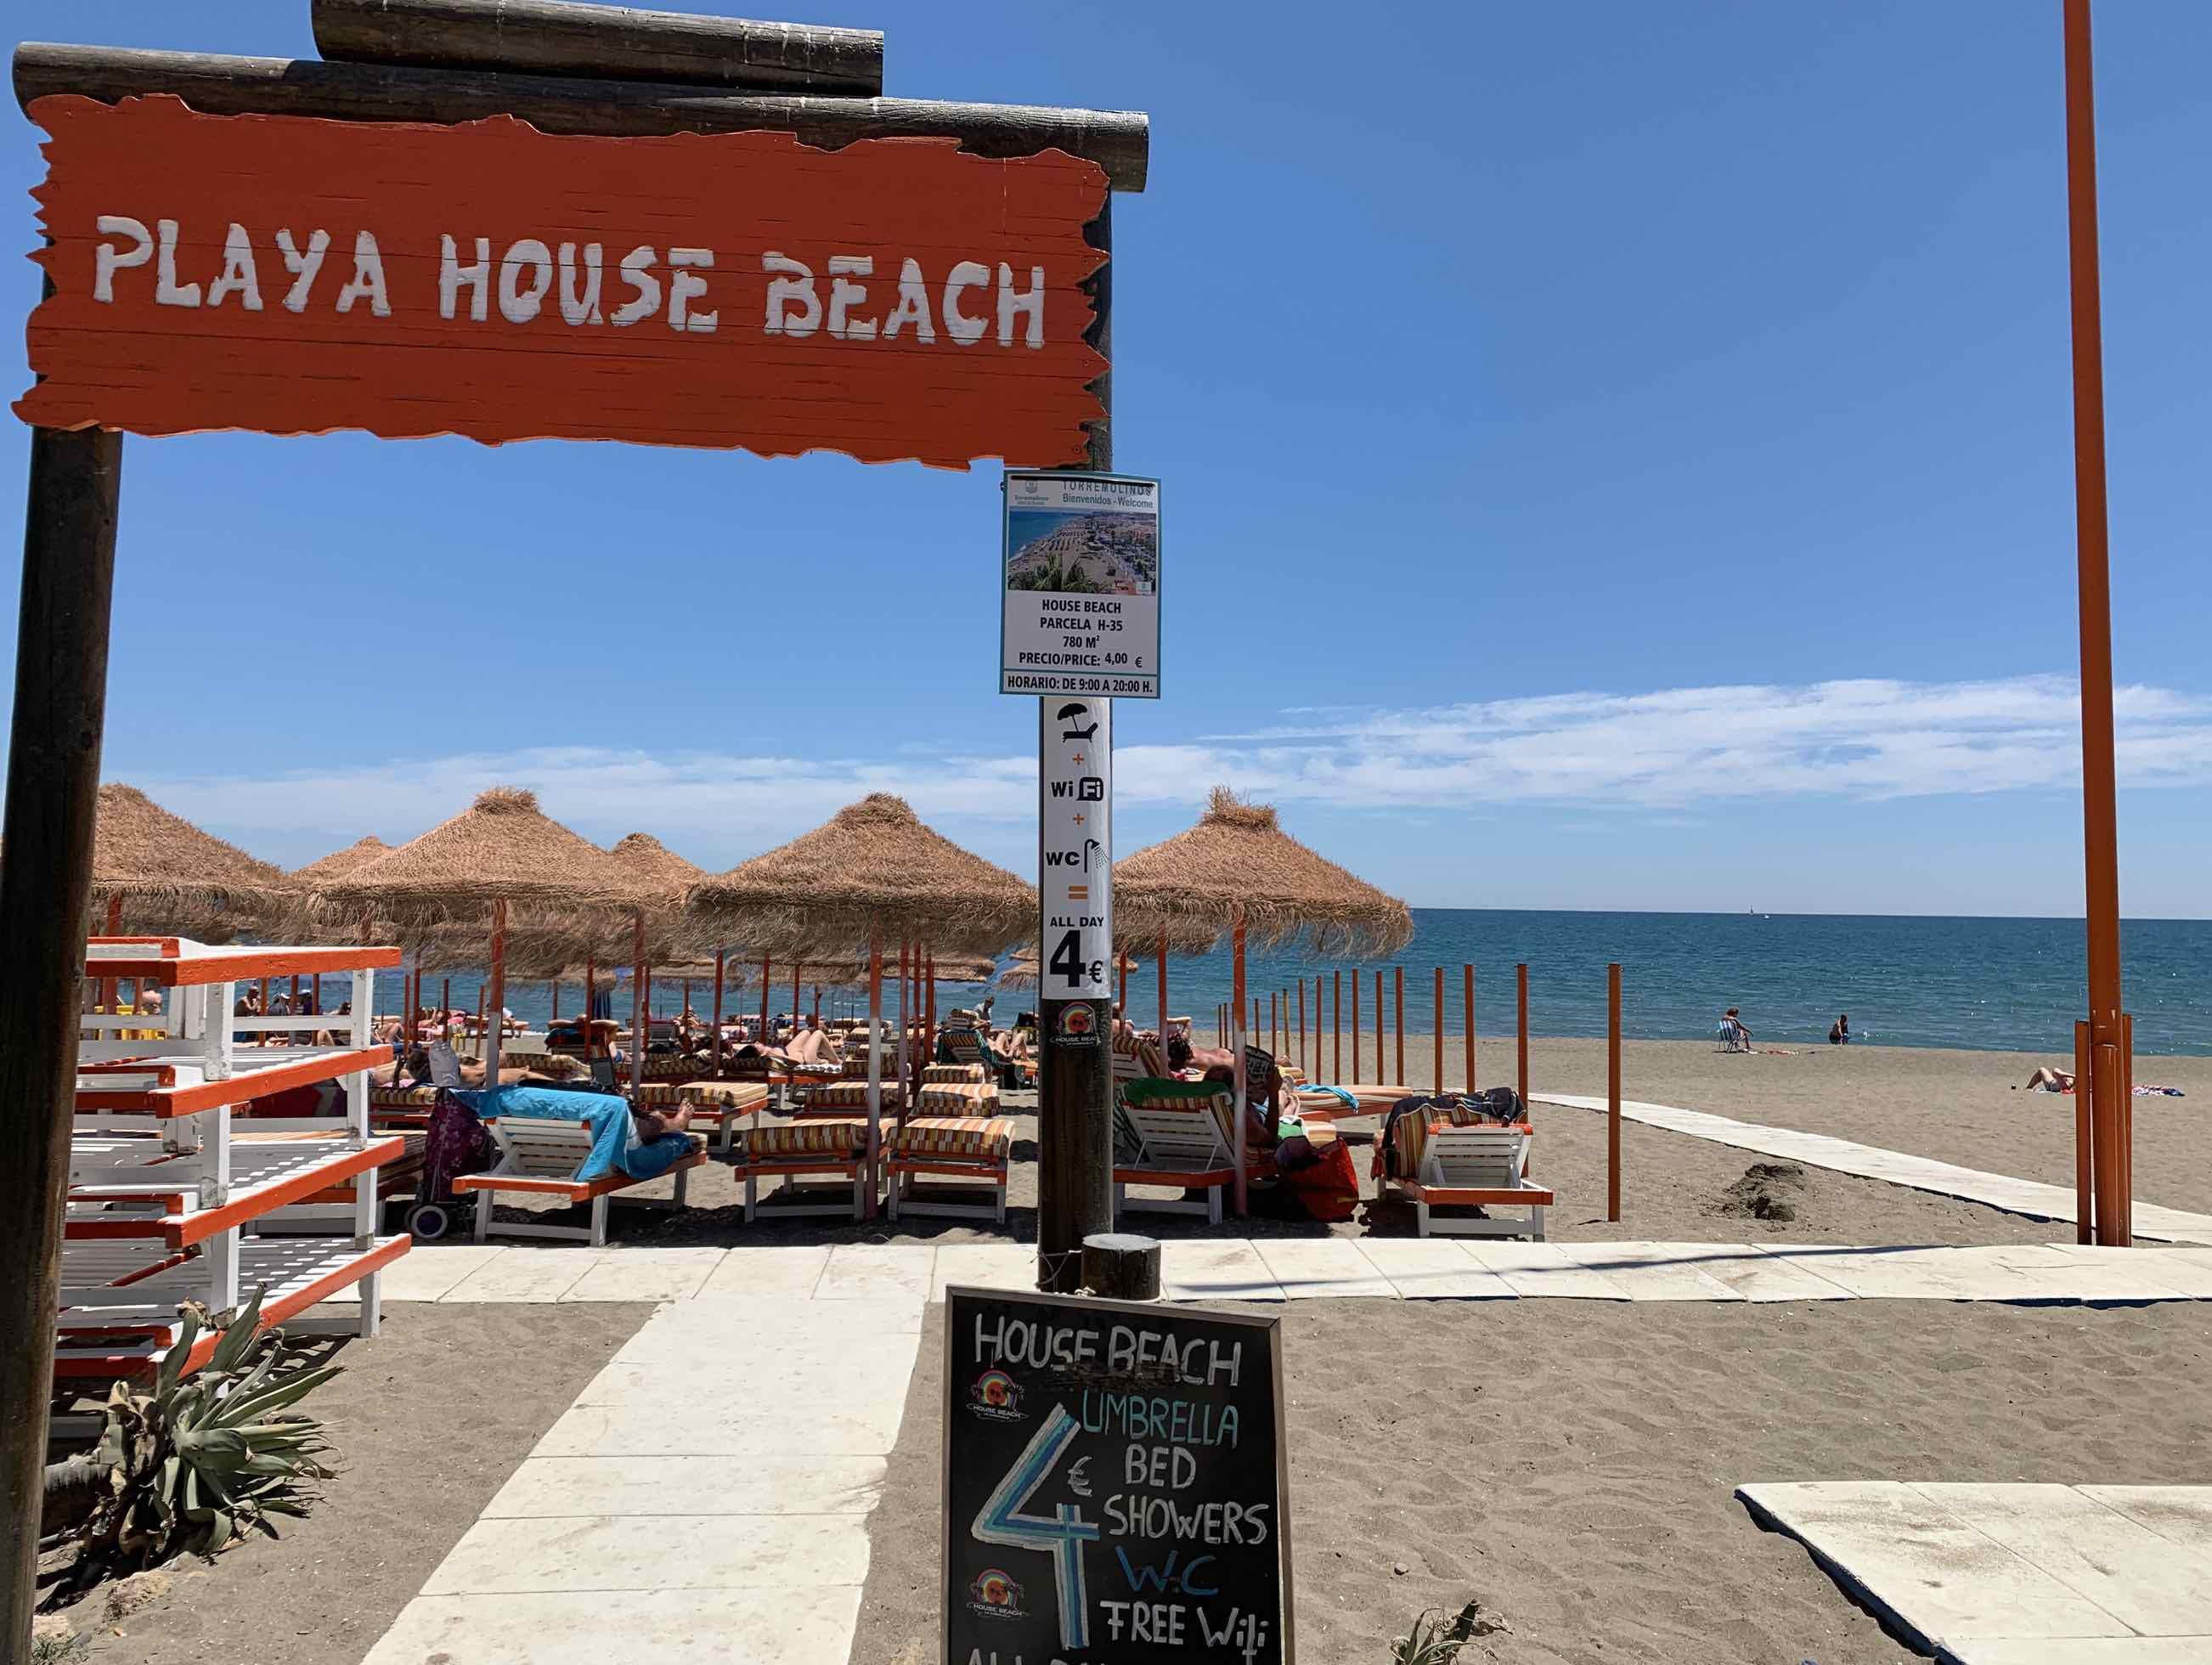 playa house beach torremolinos